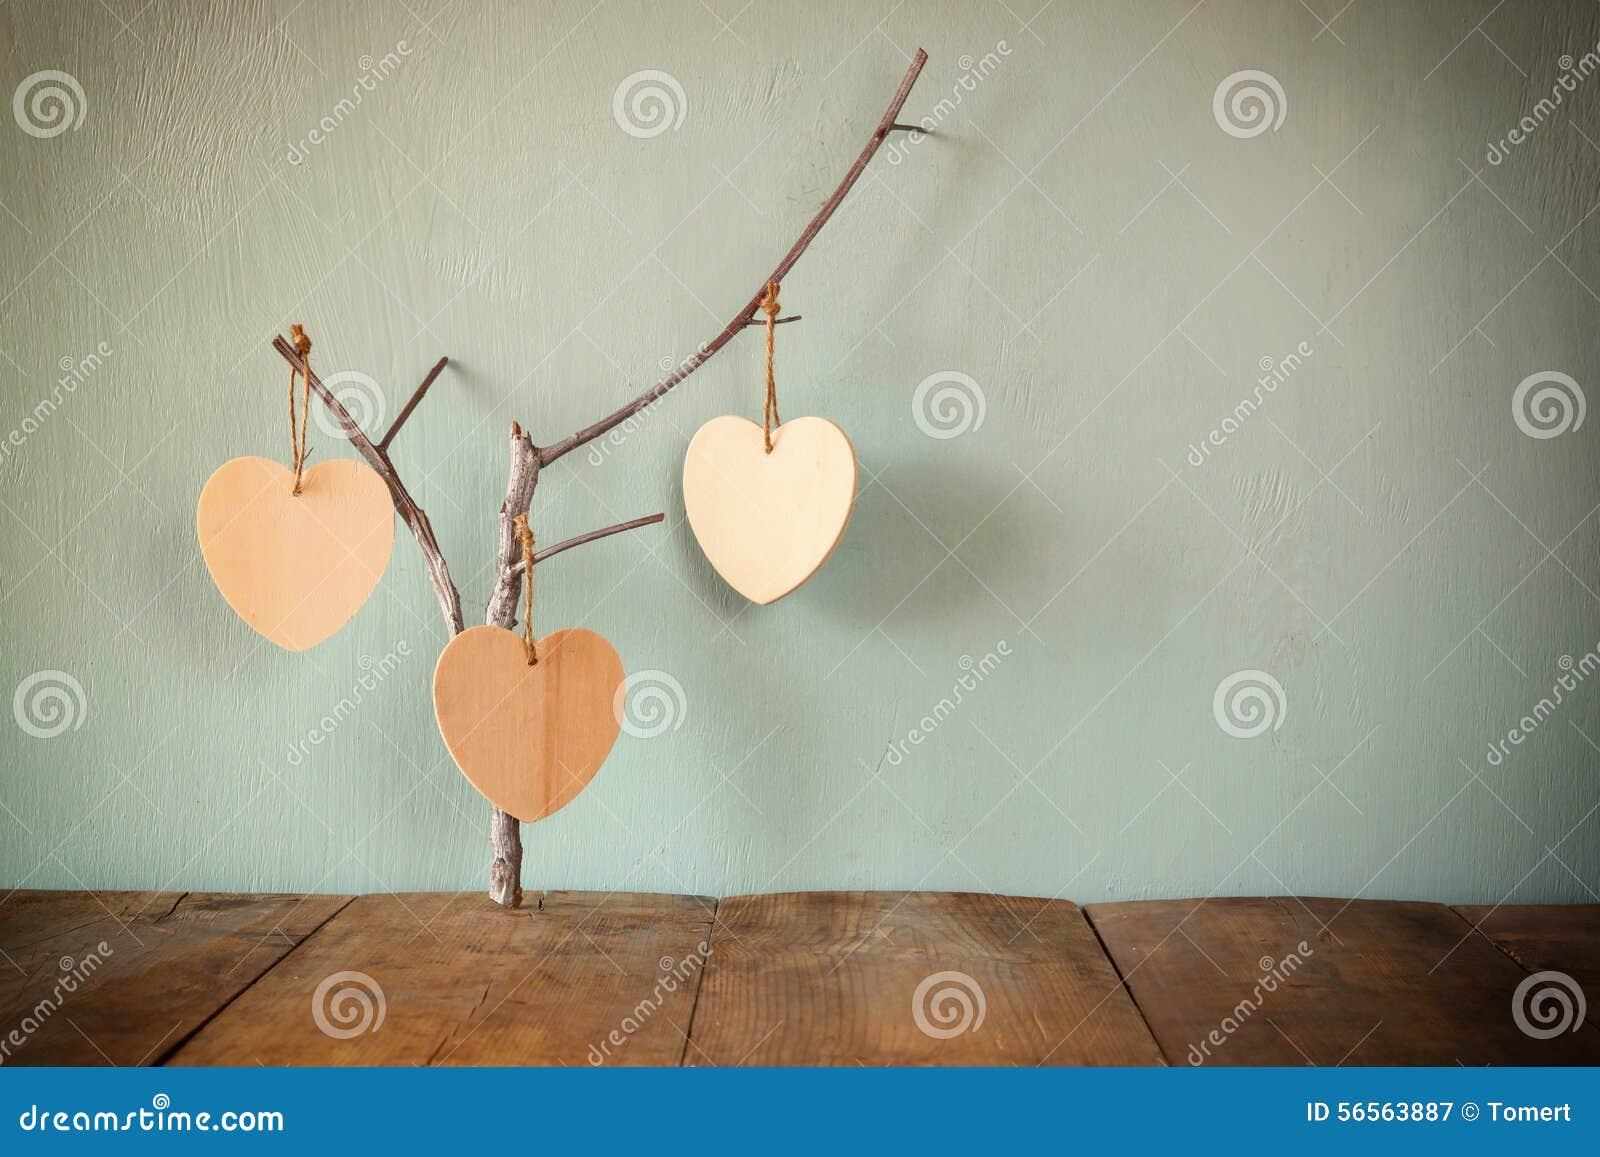 Download Αφηρημένη εικόνα της ένωσης των ξύλινων καρδιών πέρα από το ξύλινο υπόβαθρο Στοκ Εικόνα - εικόνα από ρωμανικός, κλασικός: 56563887